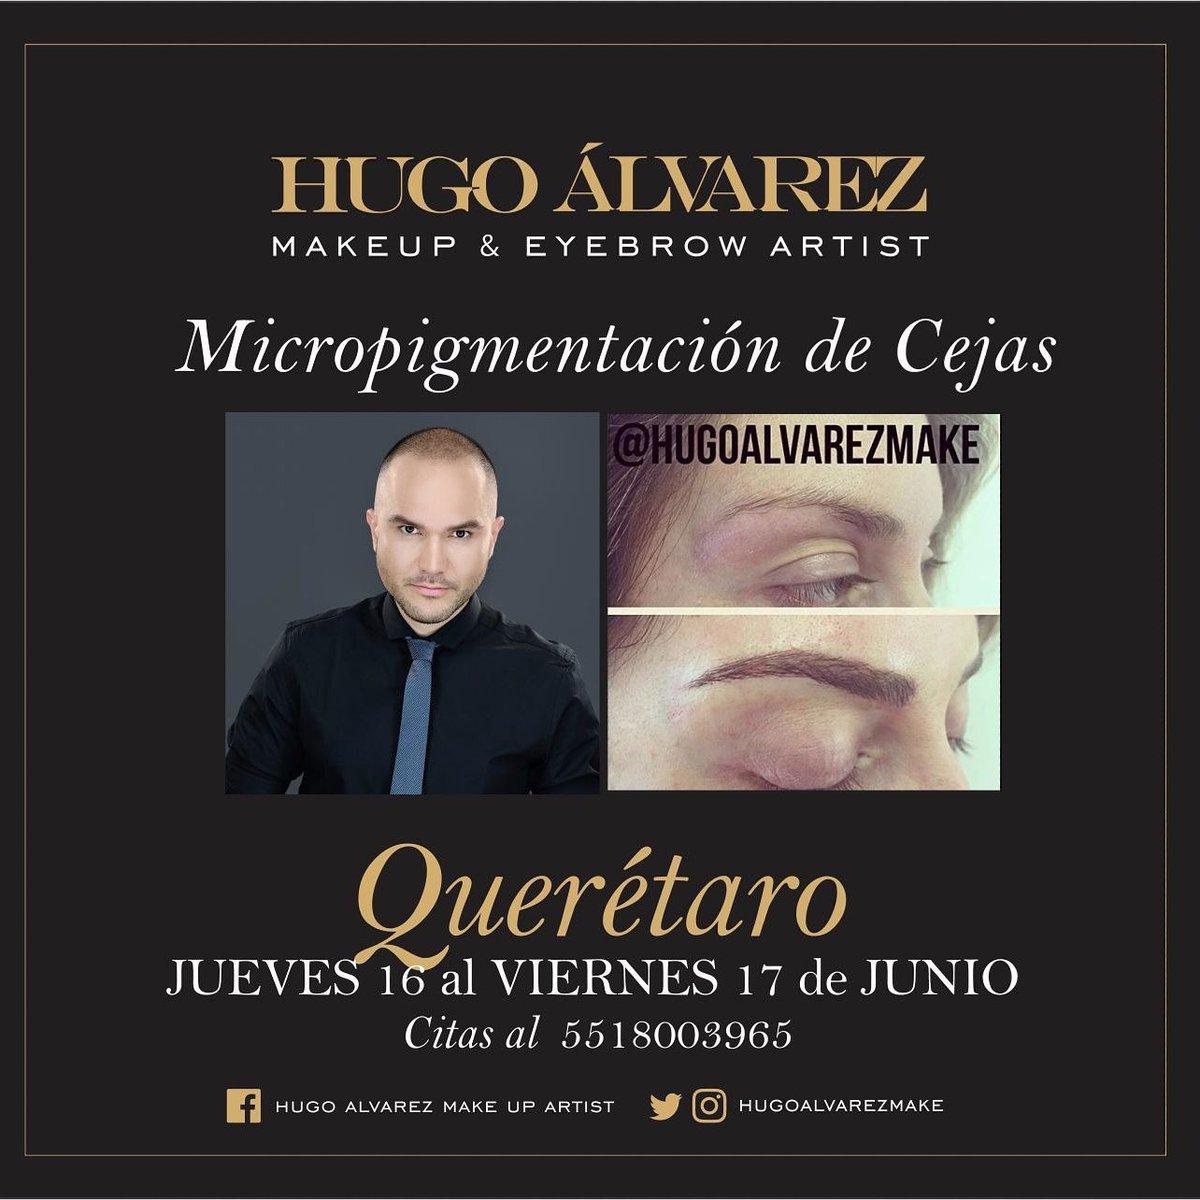 Hugo Alvarez On Twitter Próxima Parada Queretaro Citas